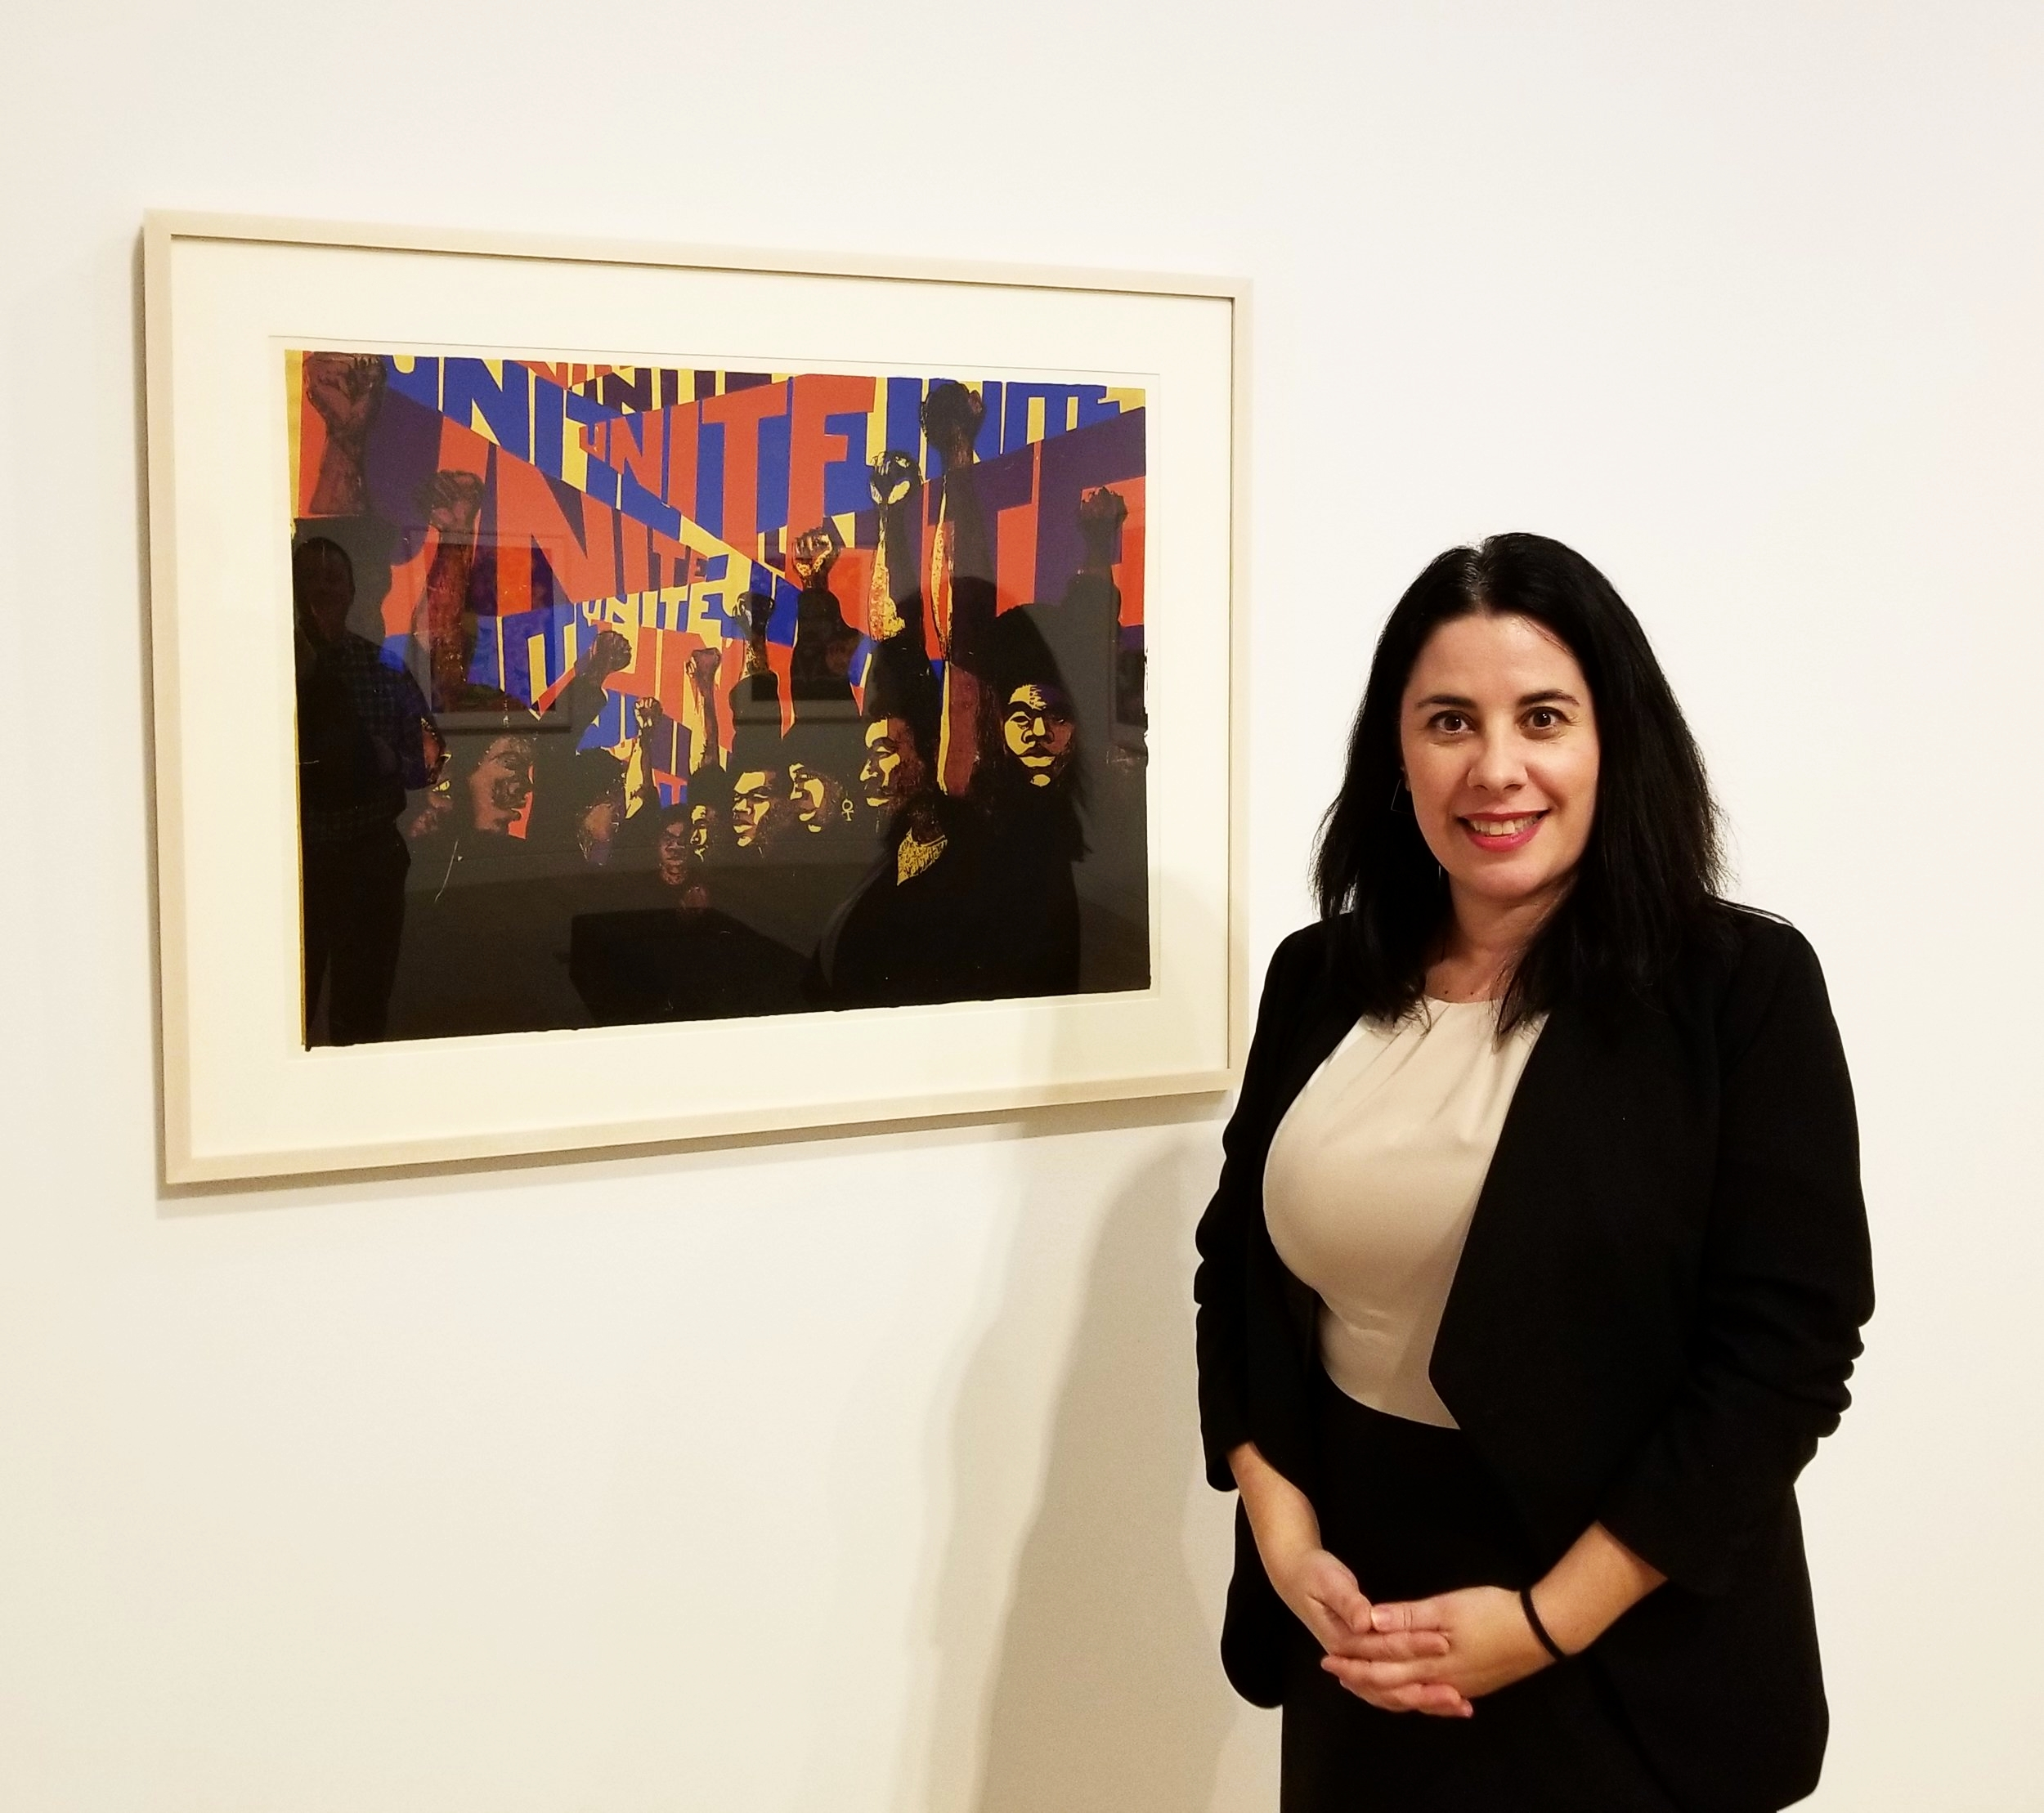 Julie Rodrigues Widholm, director/chief curator of the DePaul Art Museum